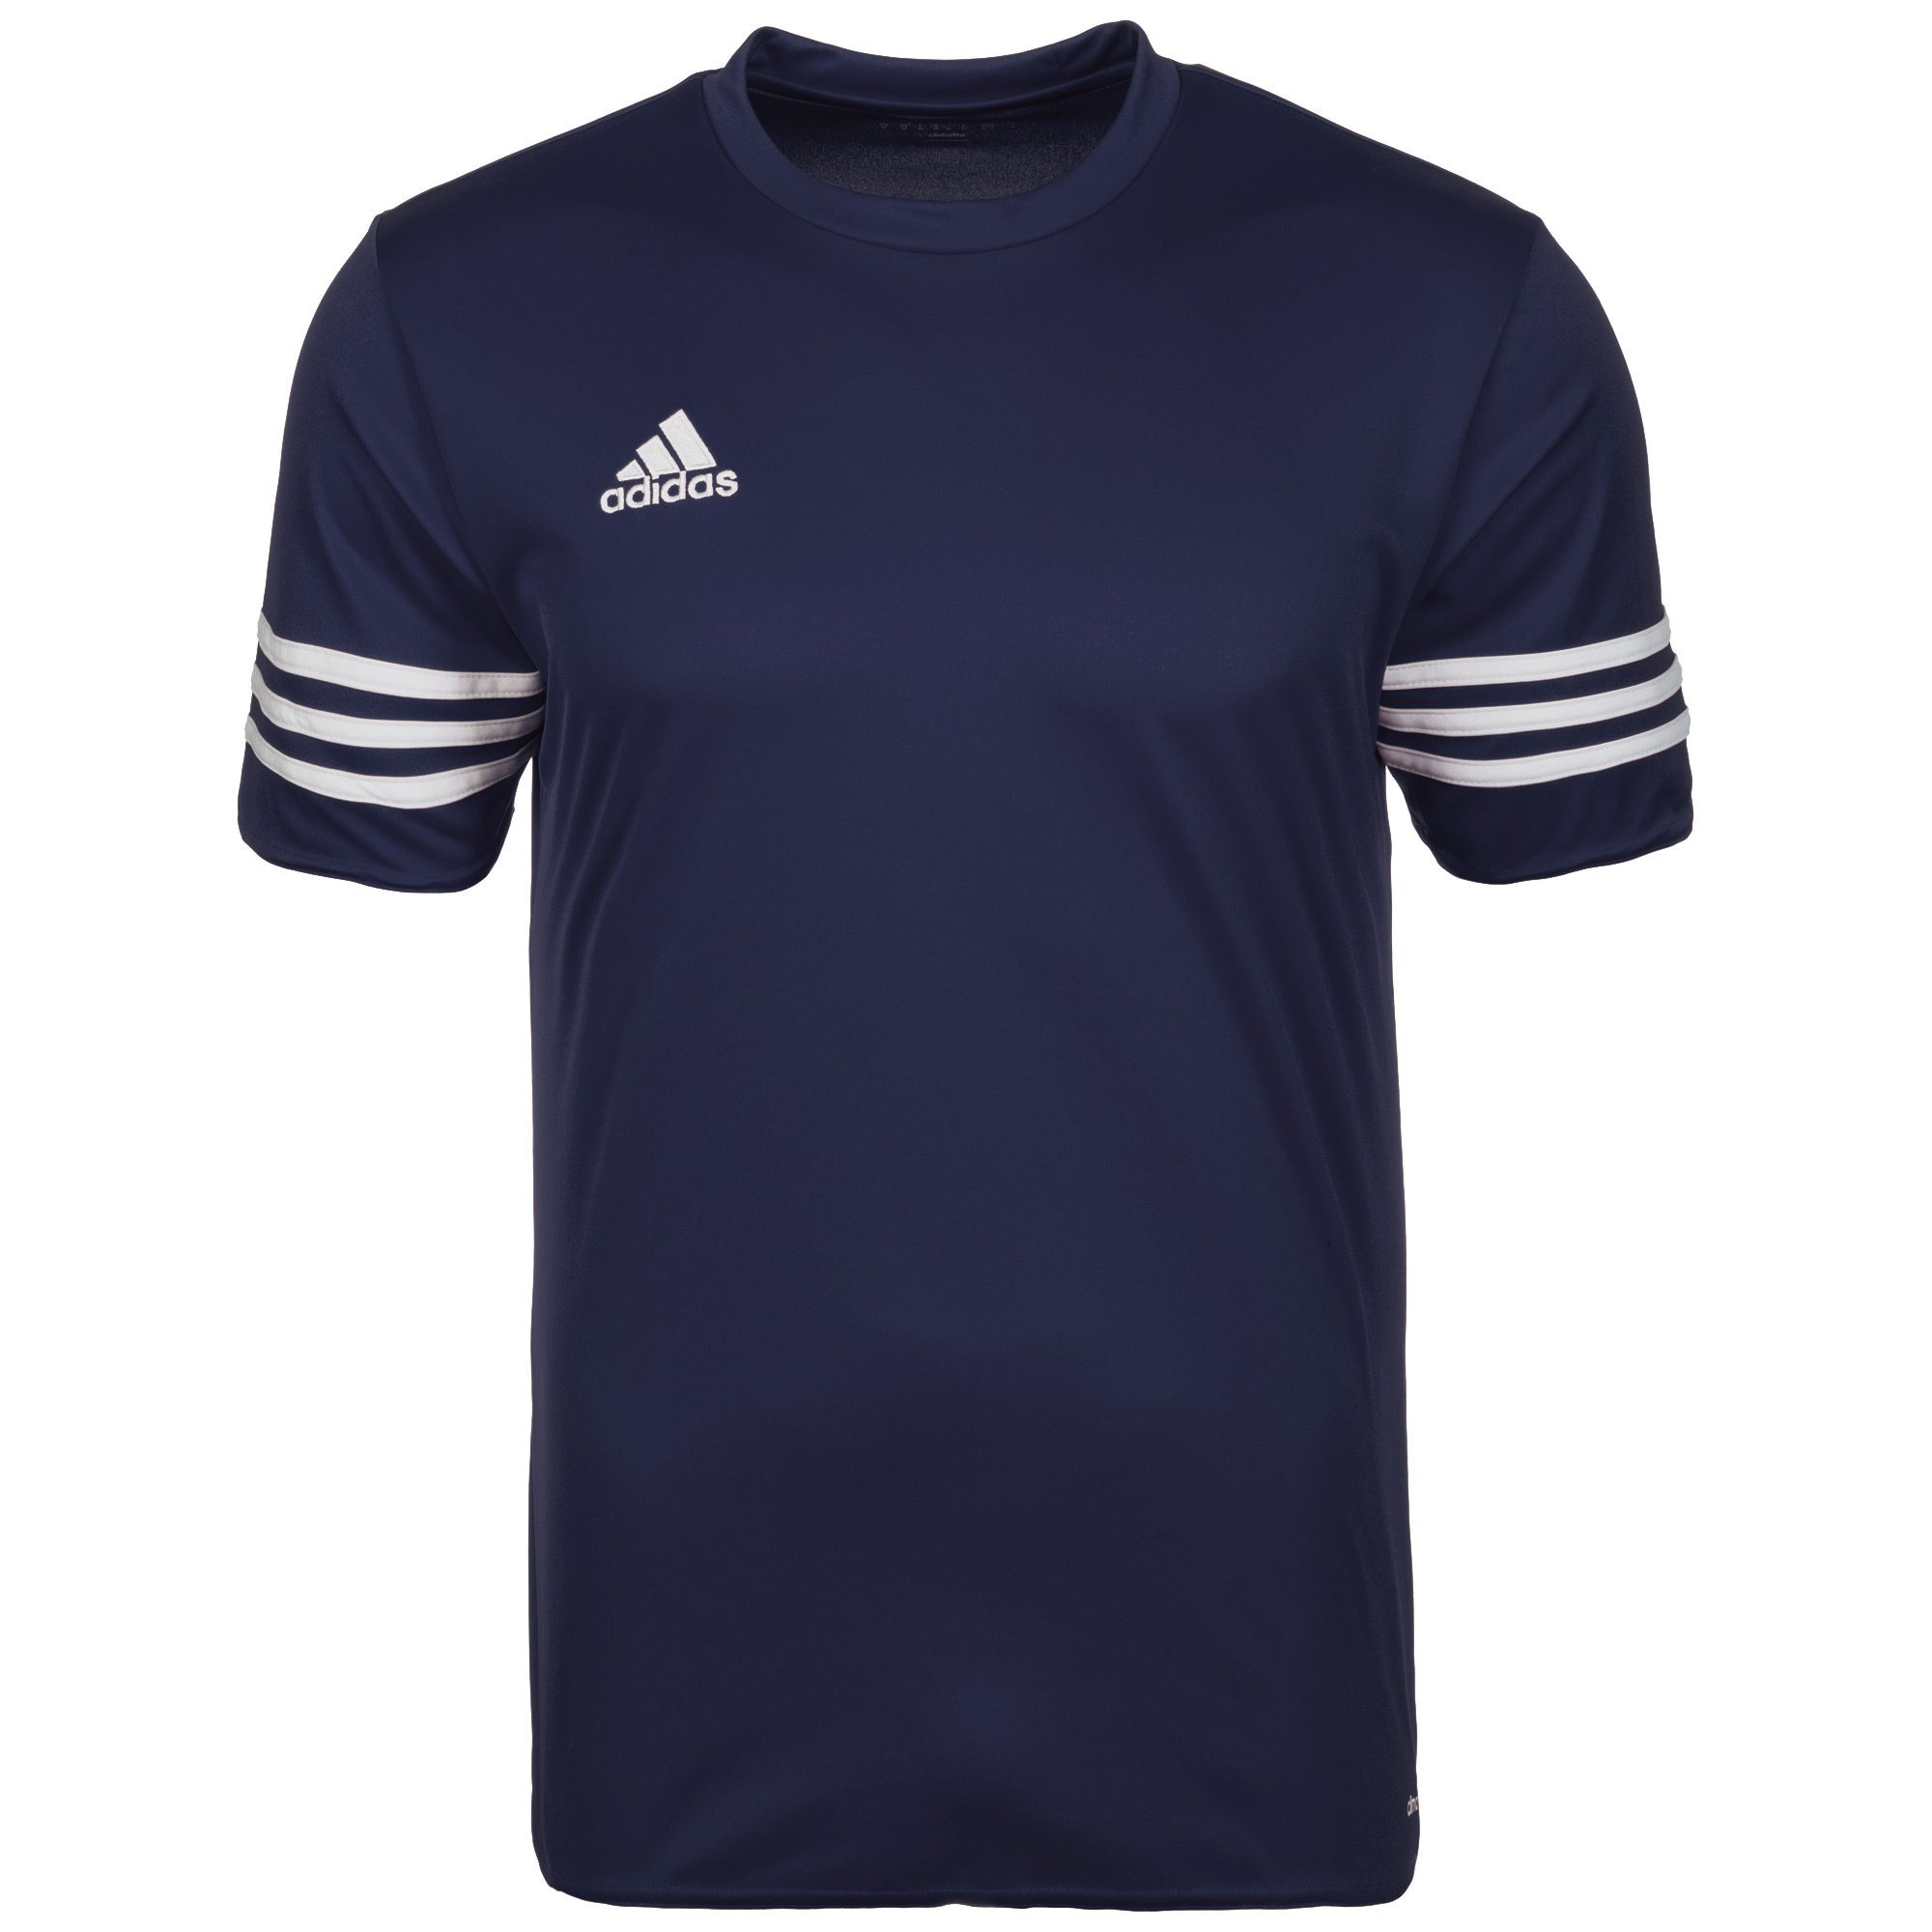 adidas Performance Fußballtrikot »Entrada 14« | Sportbekleidung > Trikots > Fußballtrikots | adidas Performance